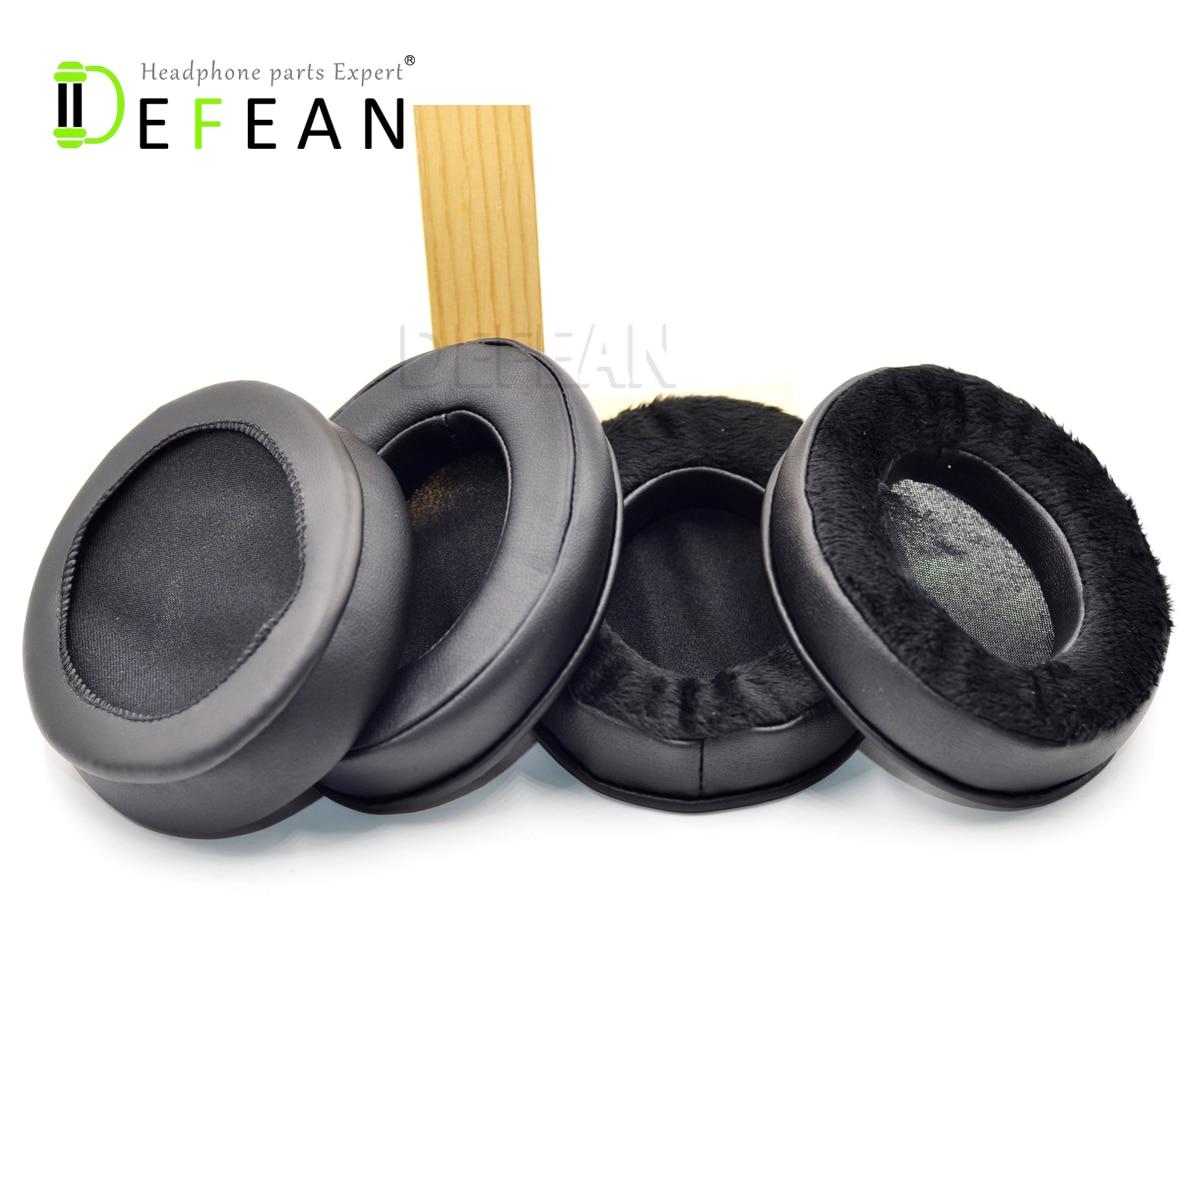 Defean 105x85mm soft ear pad cushion for TAKSTAR PRO 82 80 HI 2050 Professional Headset